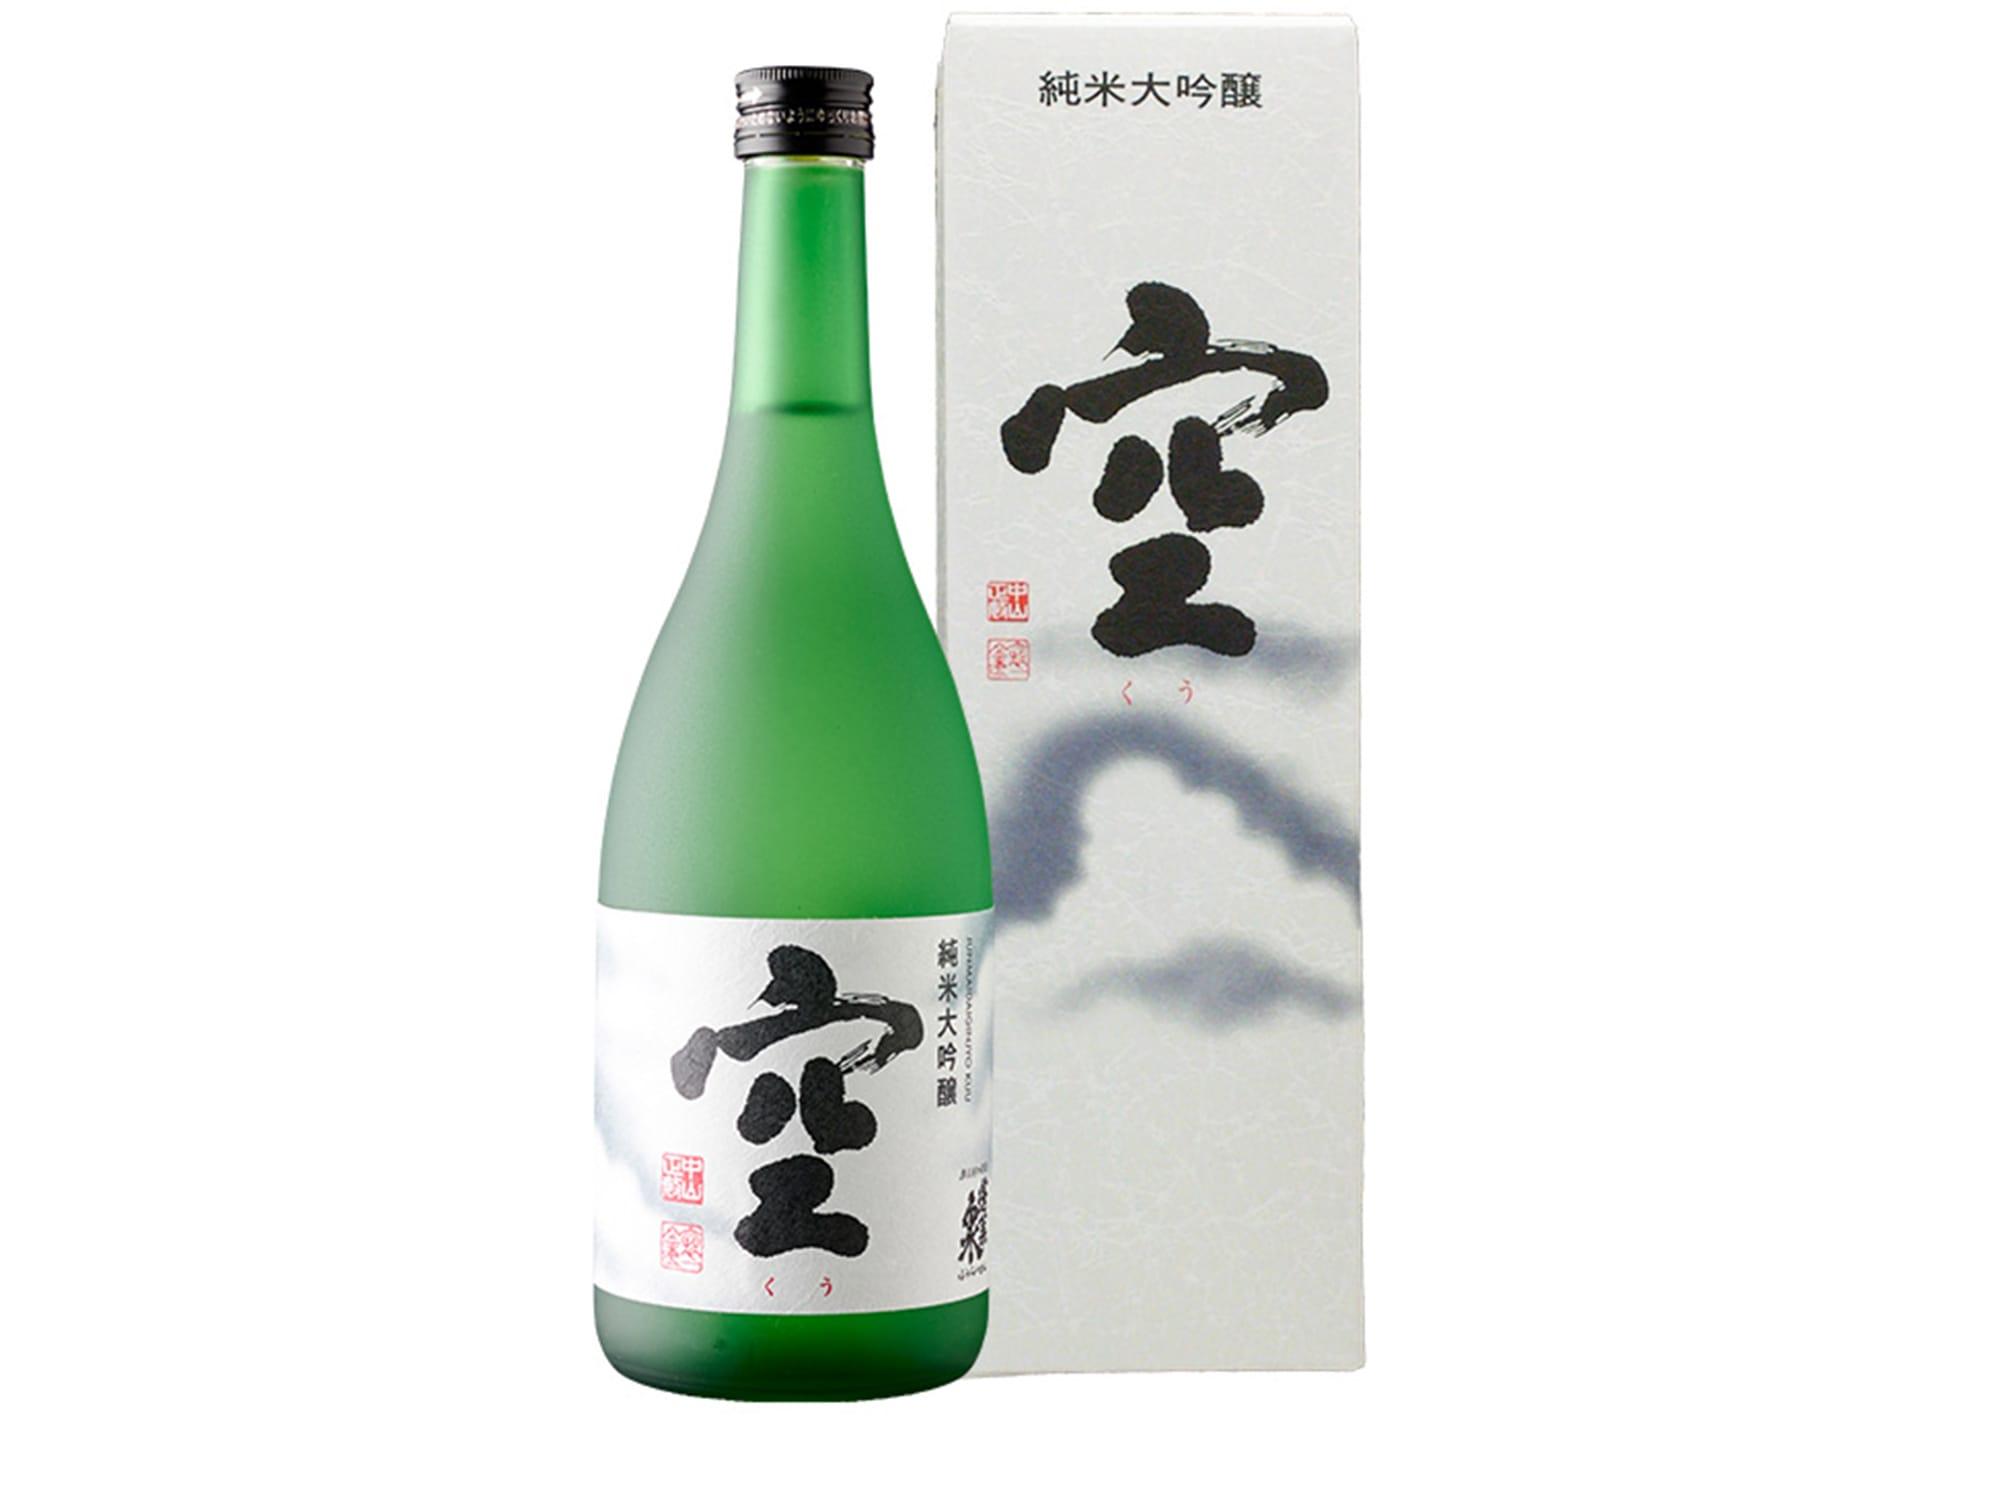 「蓬莱泉 純米大吟醸 空® くう」720ml 3,350円(税抜)